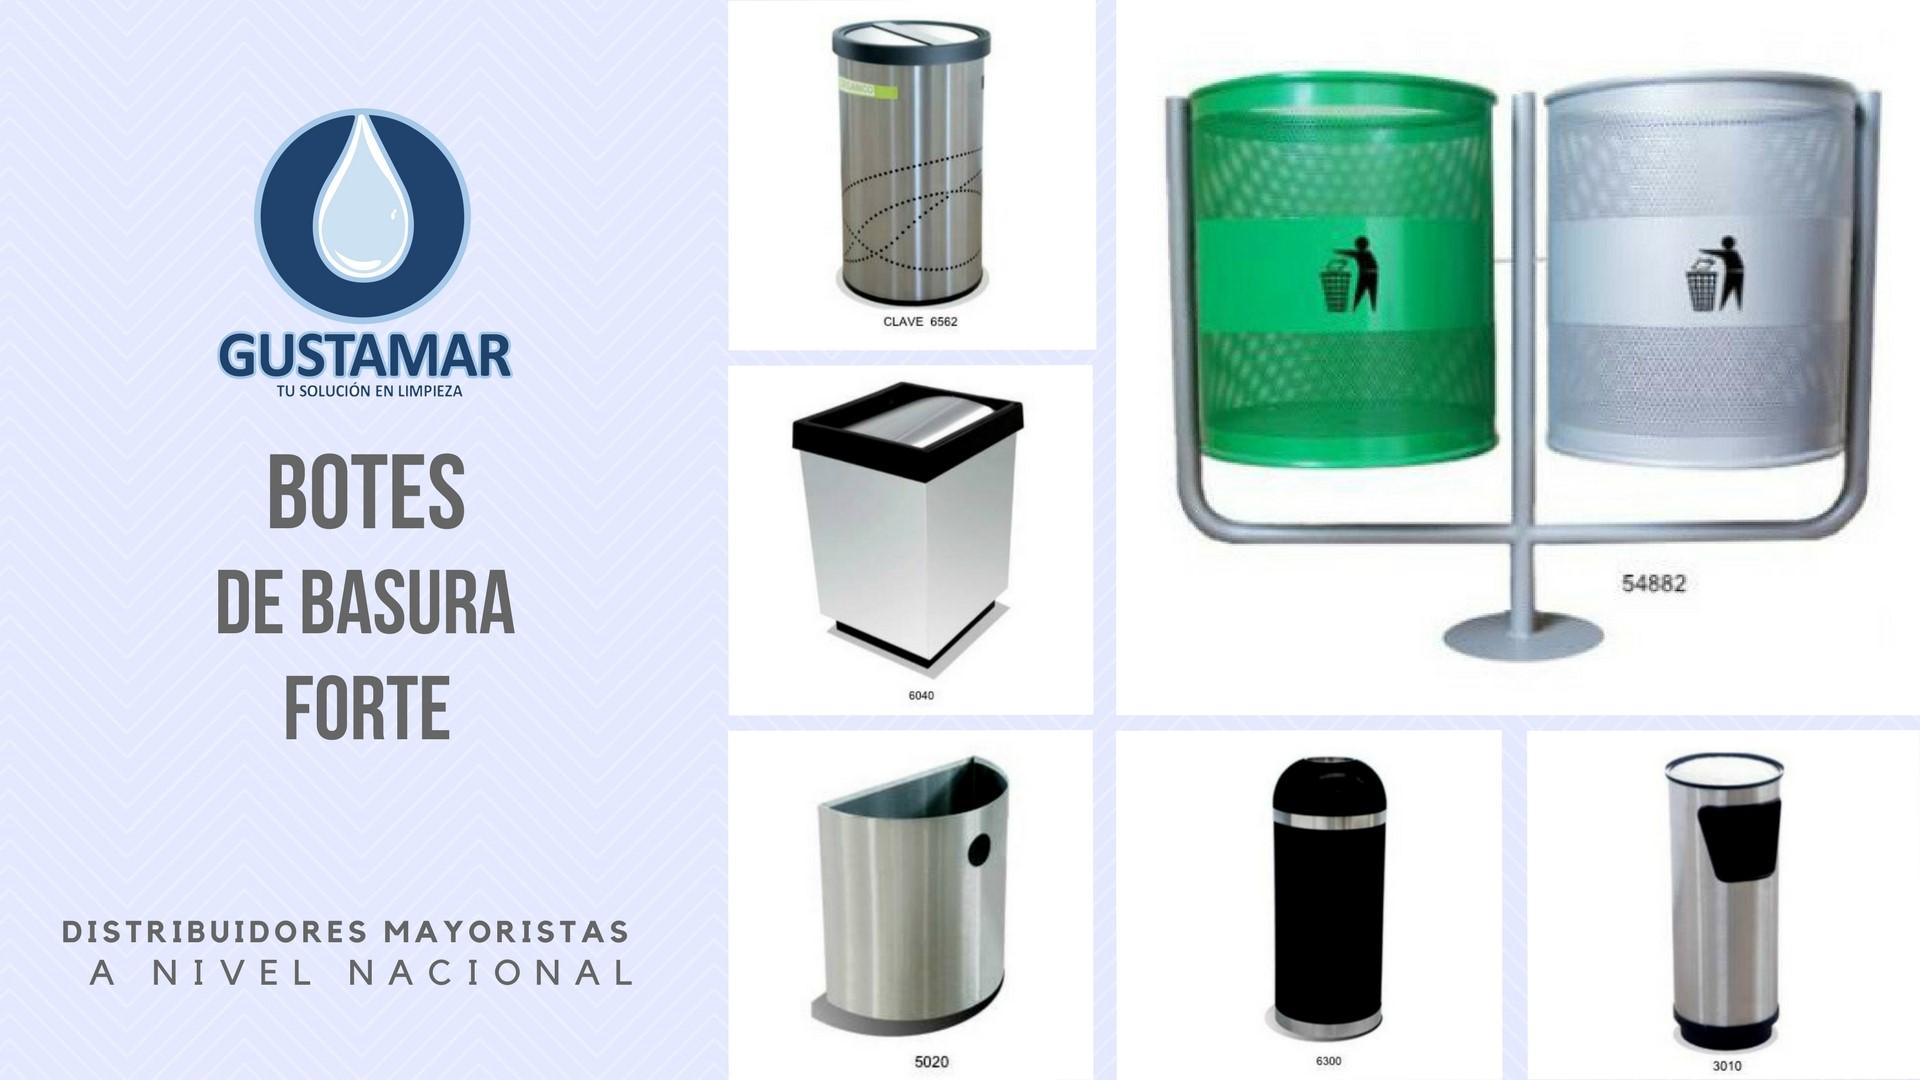 BOTES DE BASURA / BASURERO  FORTE